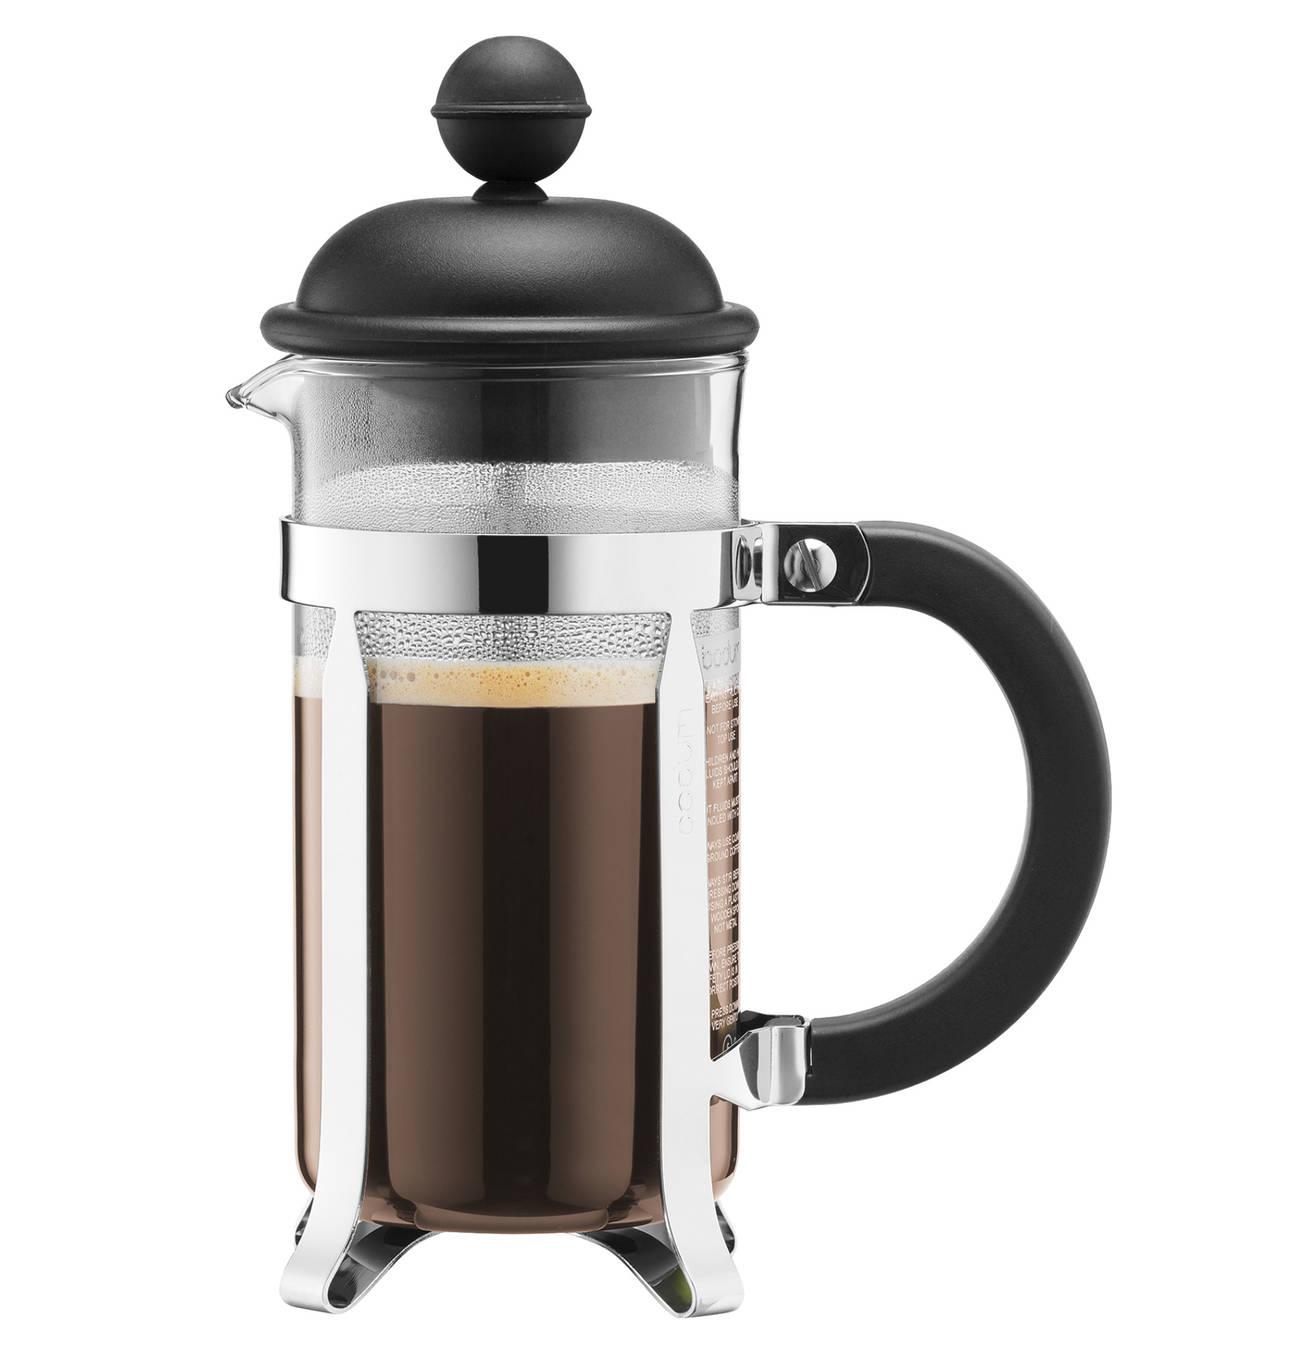 bodum caffettiera french press system kaffeebereiter 0 35l schwarz ebay. Black Bedroom Furniture Sets. Home Design Ideas